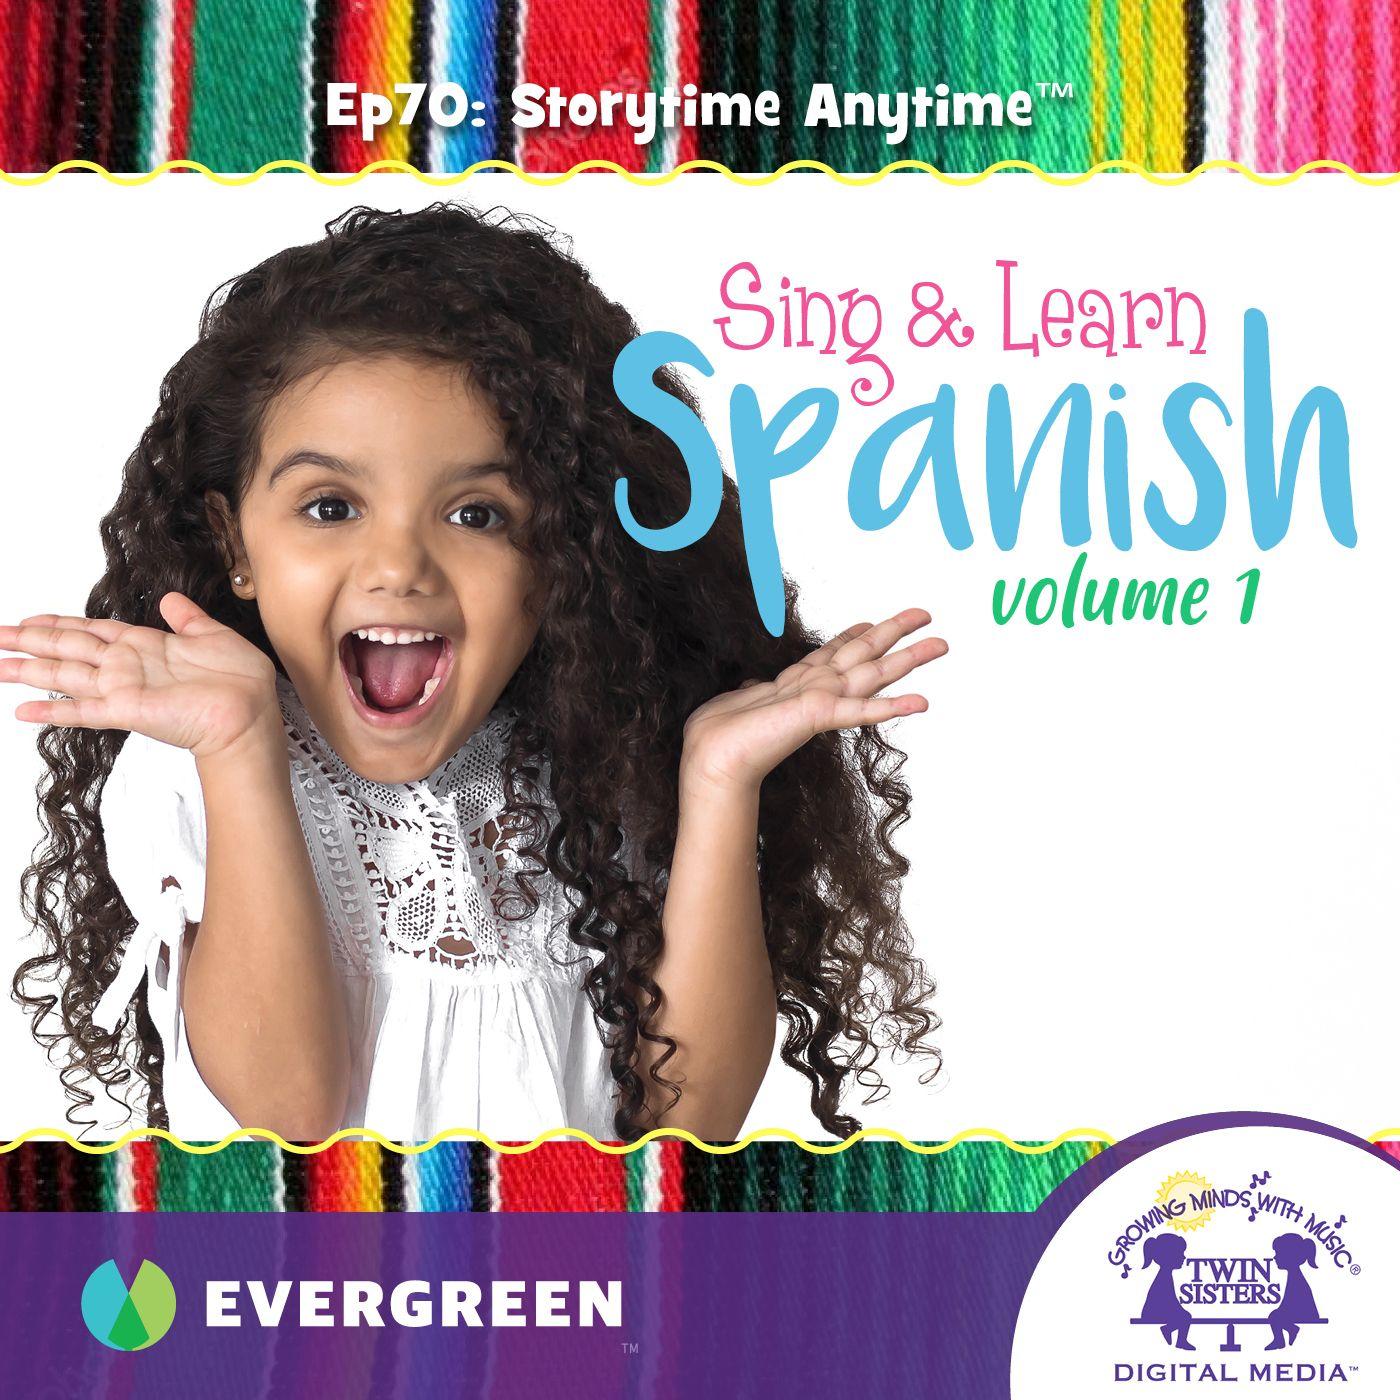 Sing & Learn Spanish Volume 1